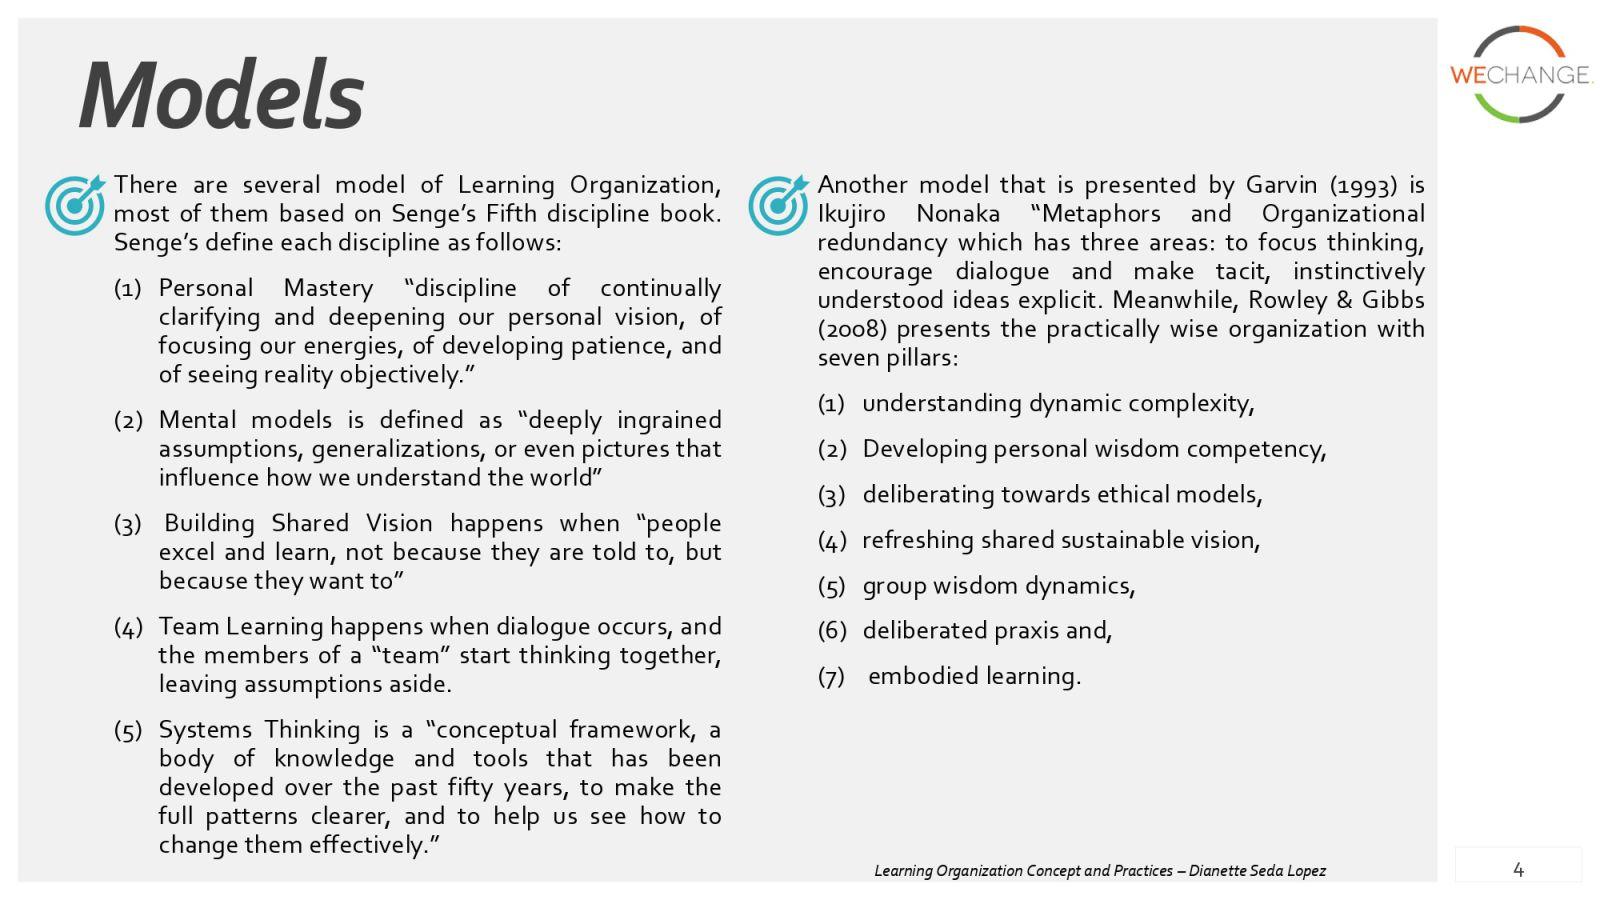 learnin organization in practice page 0004 compressed The learning organization in practice